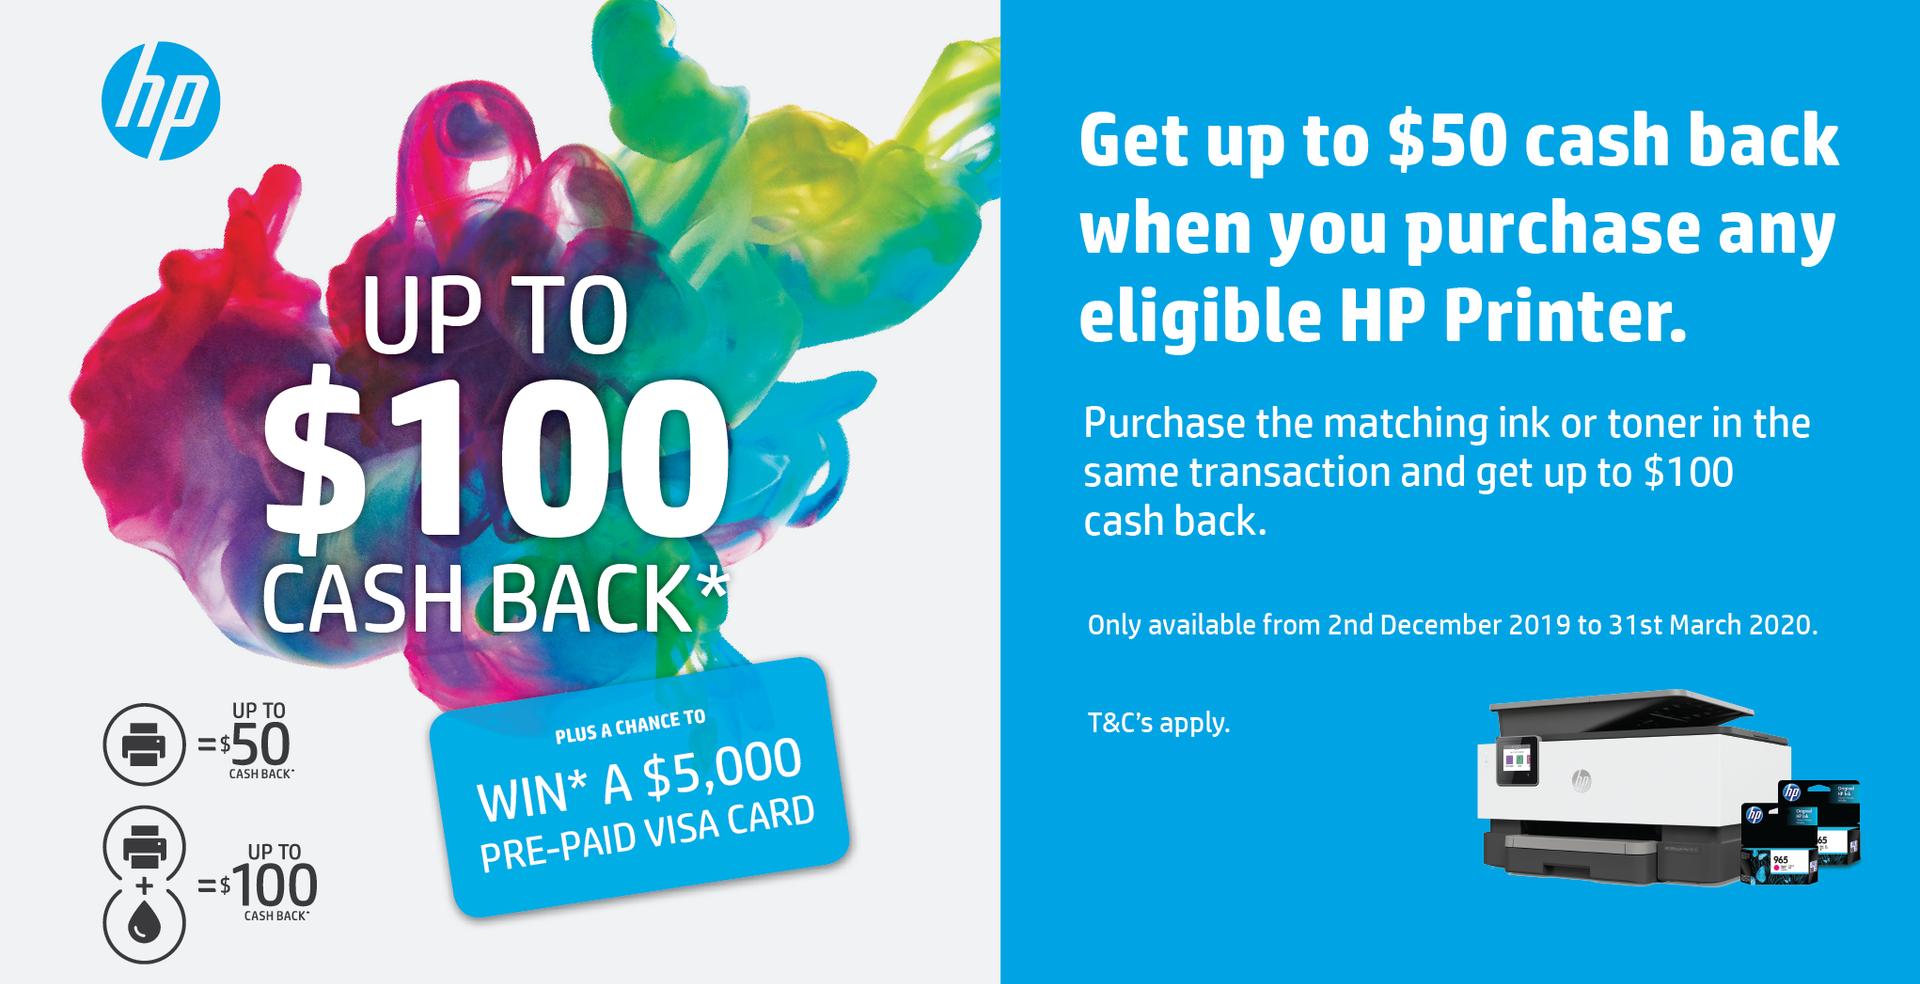 HP Back to School Cash Back Promotion